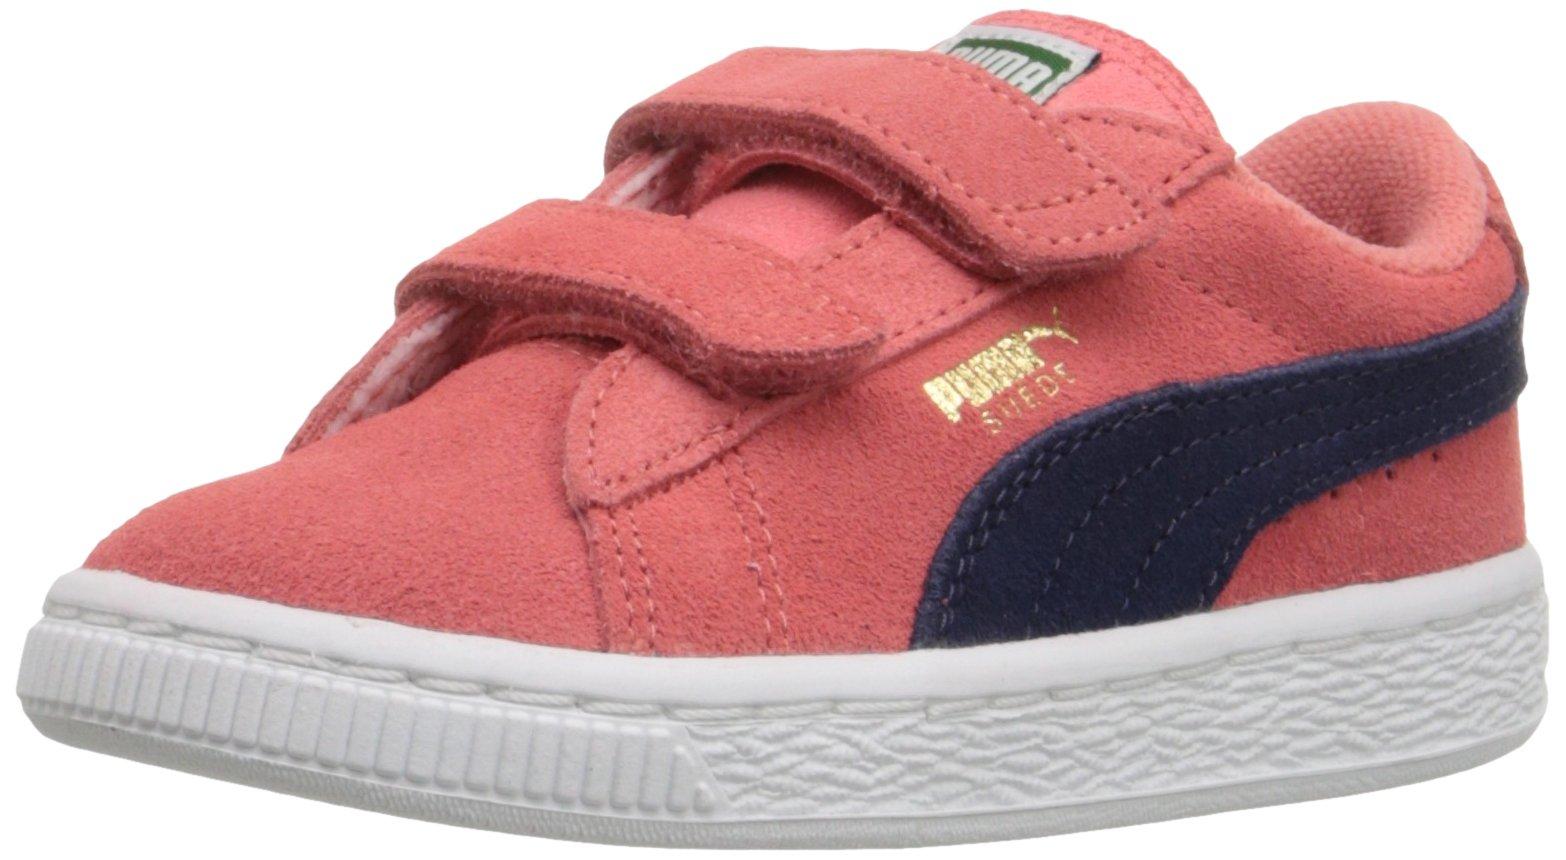 PUMA Suede 2 Straps Inf Sneaker (Toddler), Porcelain Rose/Peacoat, 4 M US Toddler